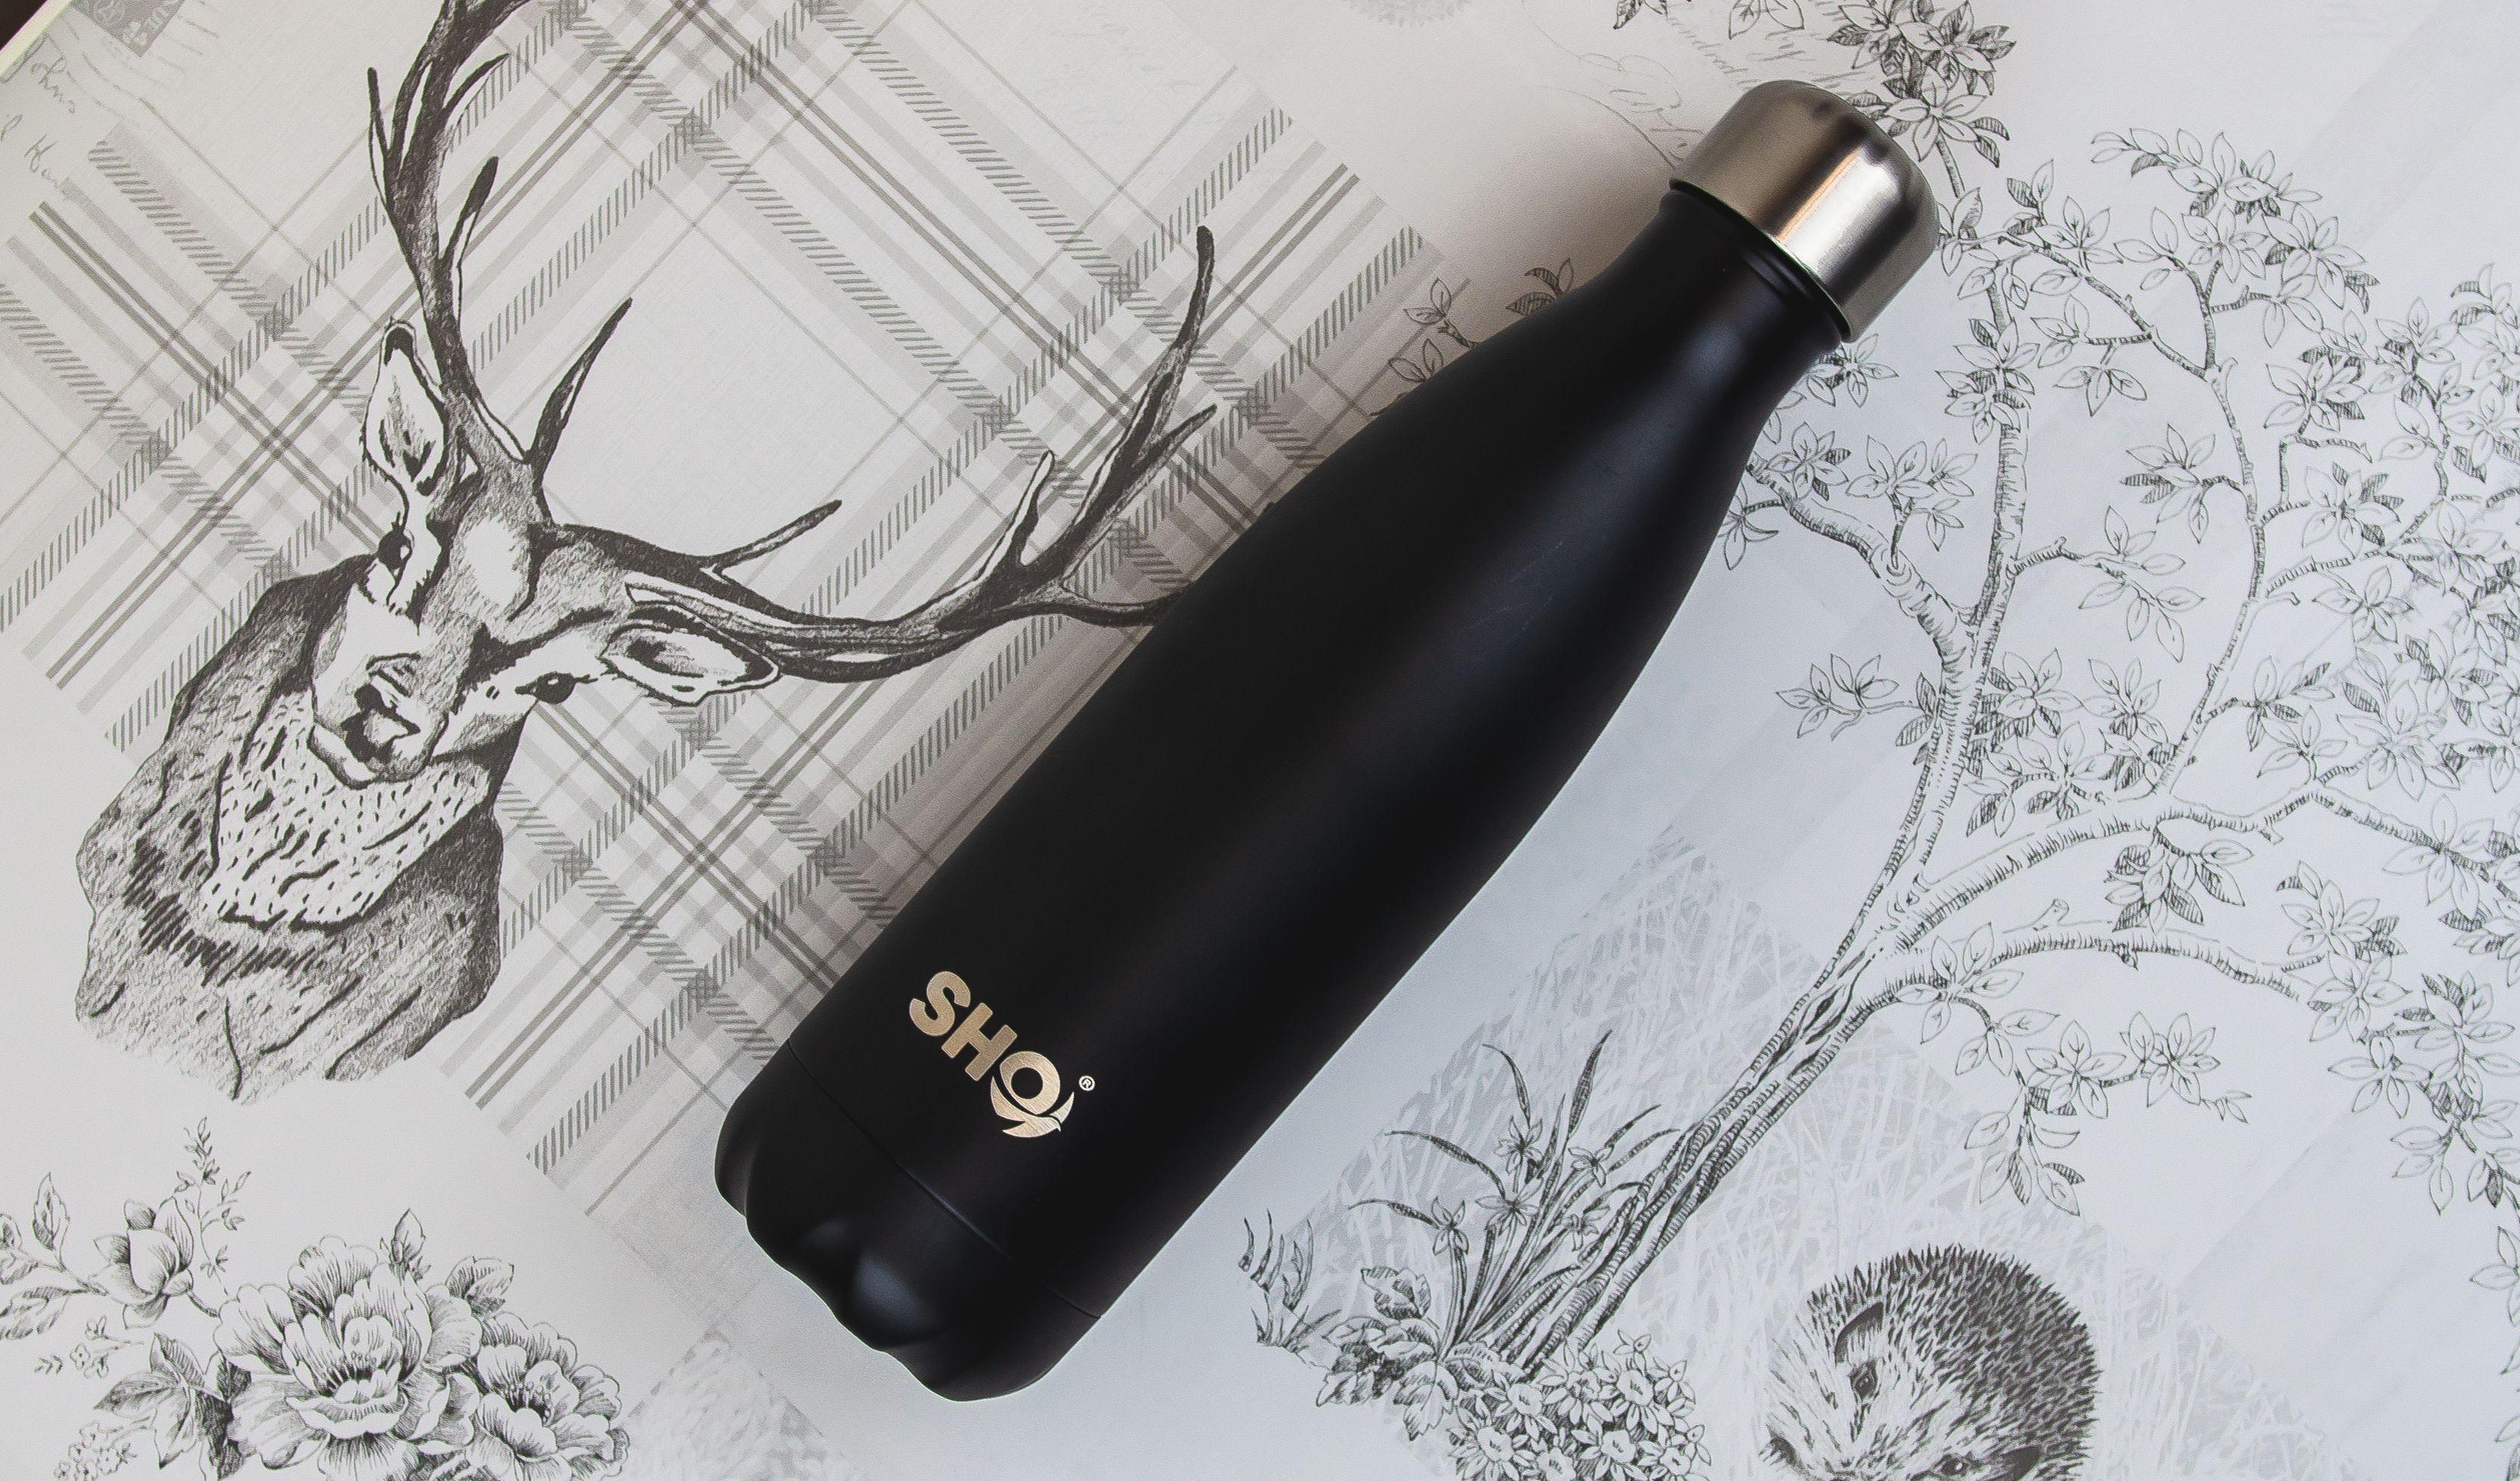 Aesthetic Water Bottle Uk